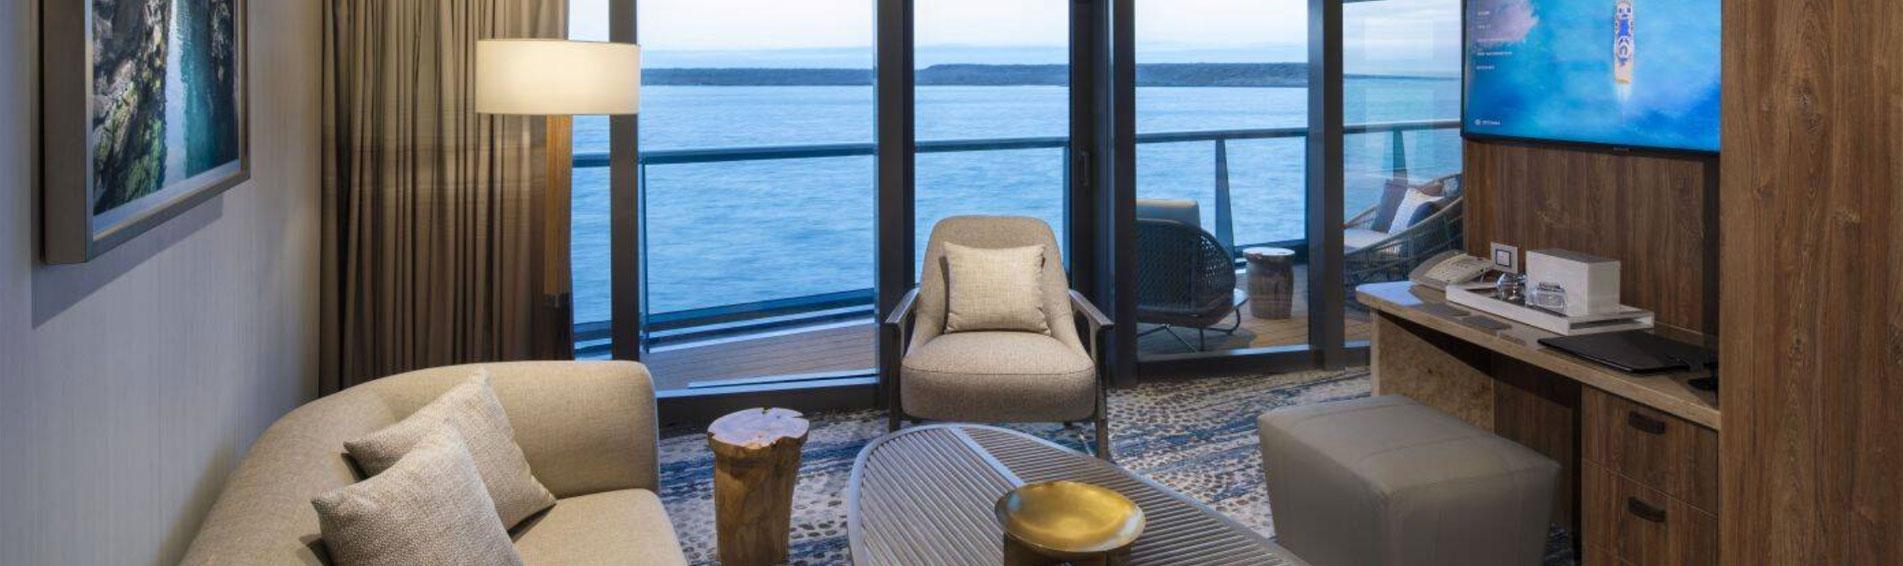 CELEBRITY FLORA Royal Suite